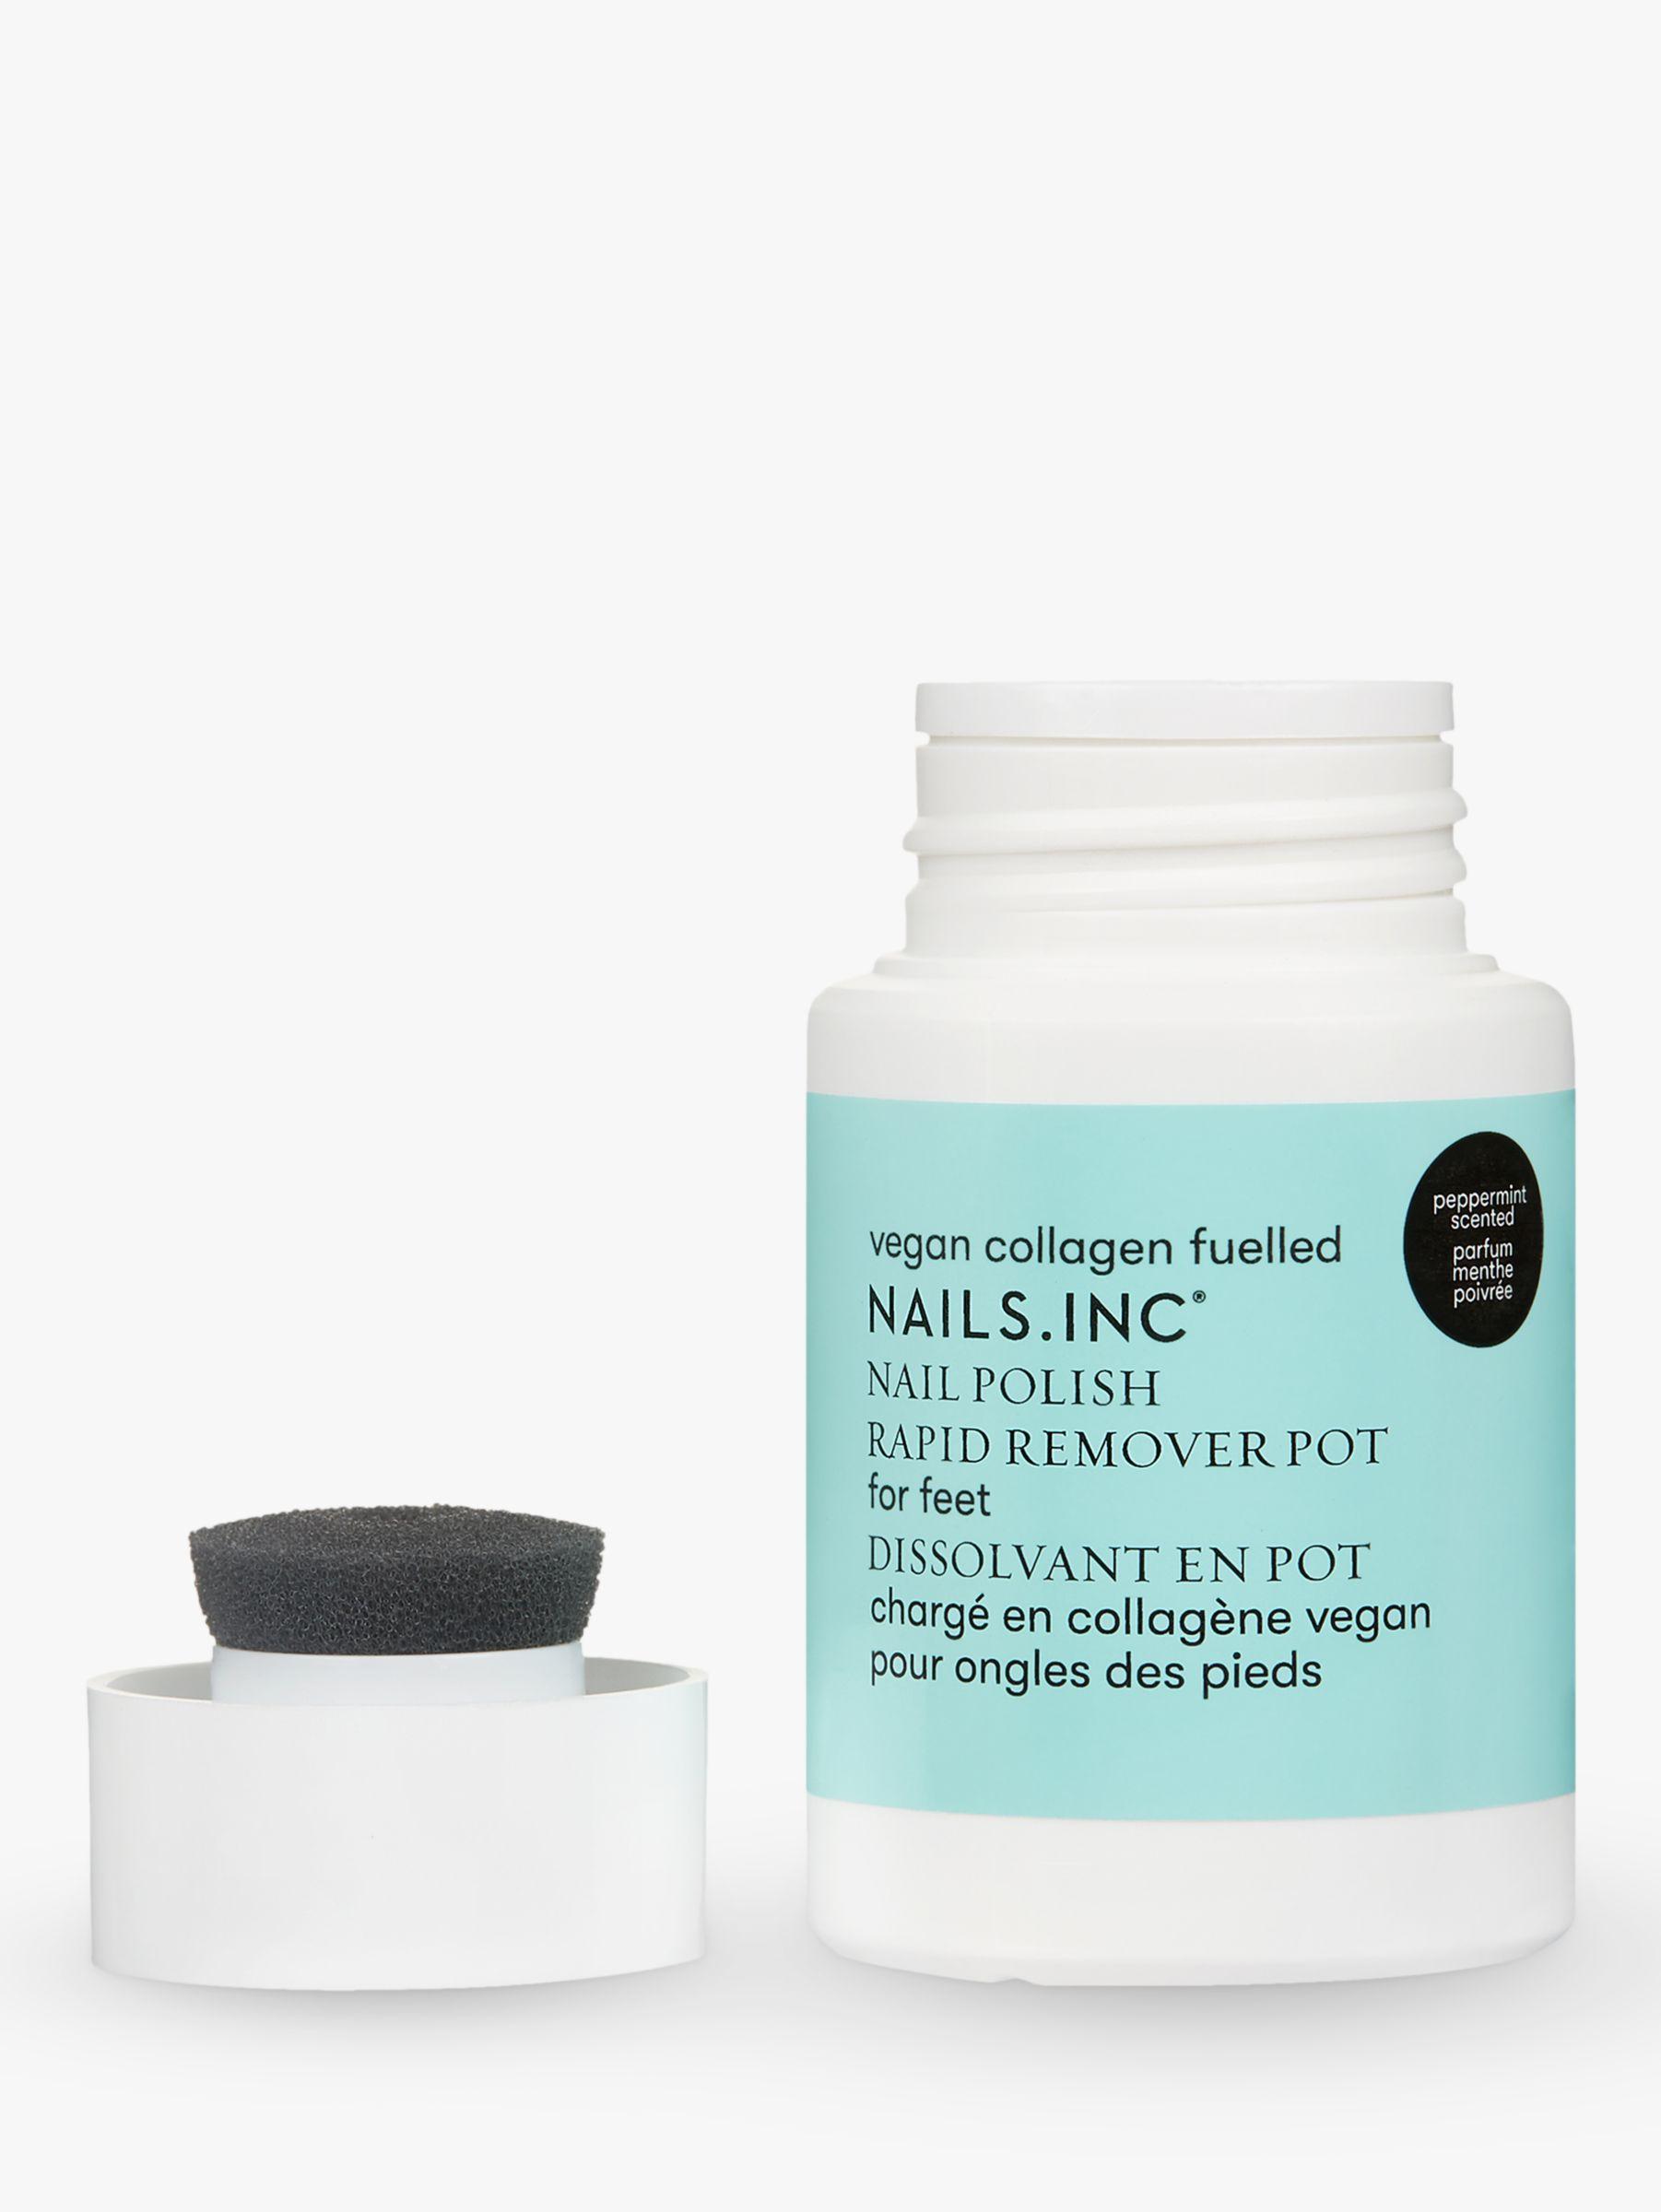 Nails Inc Nails Inc Nail Polish Rapid Remover Pot for Feet, 60ml